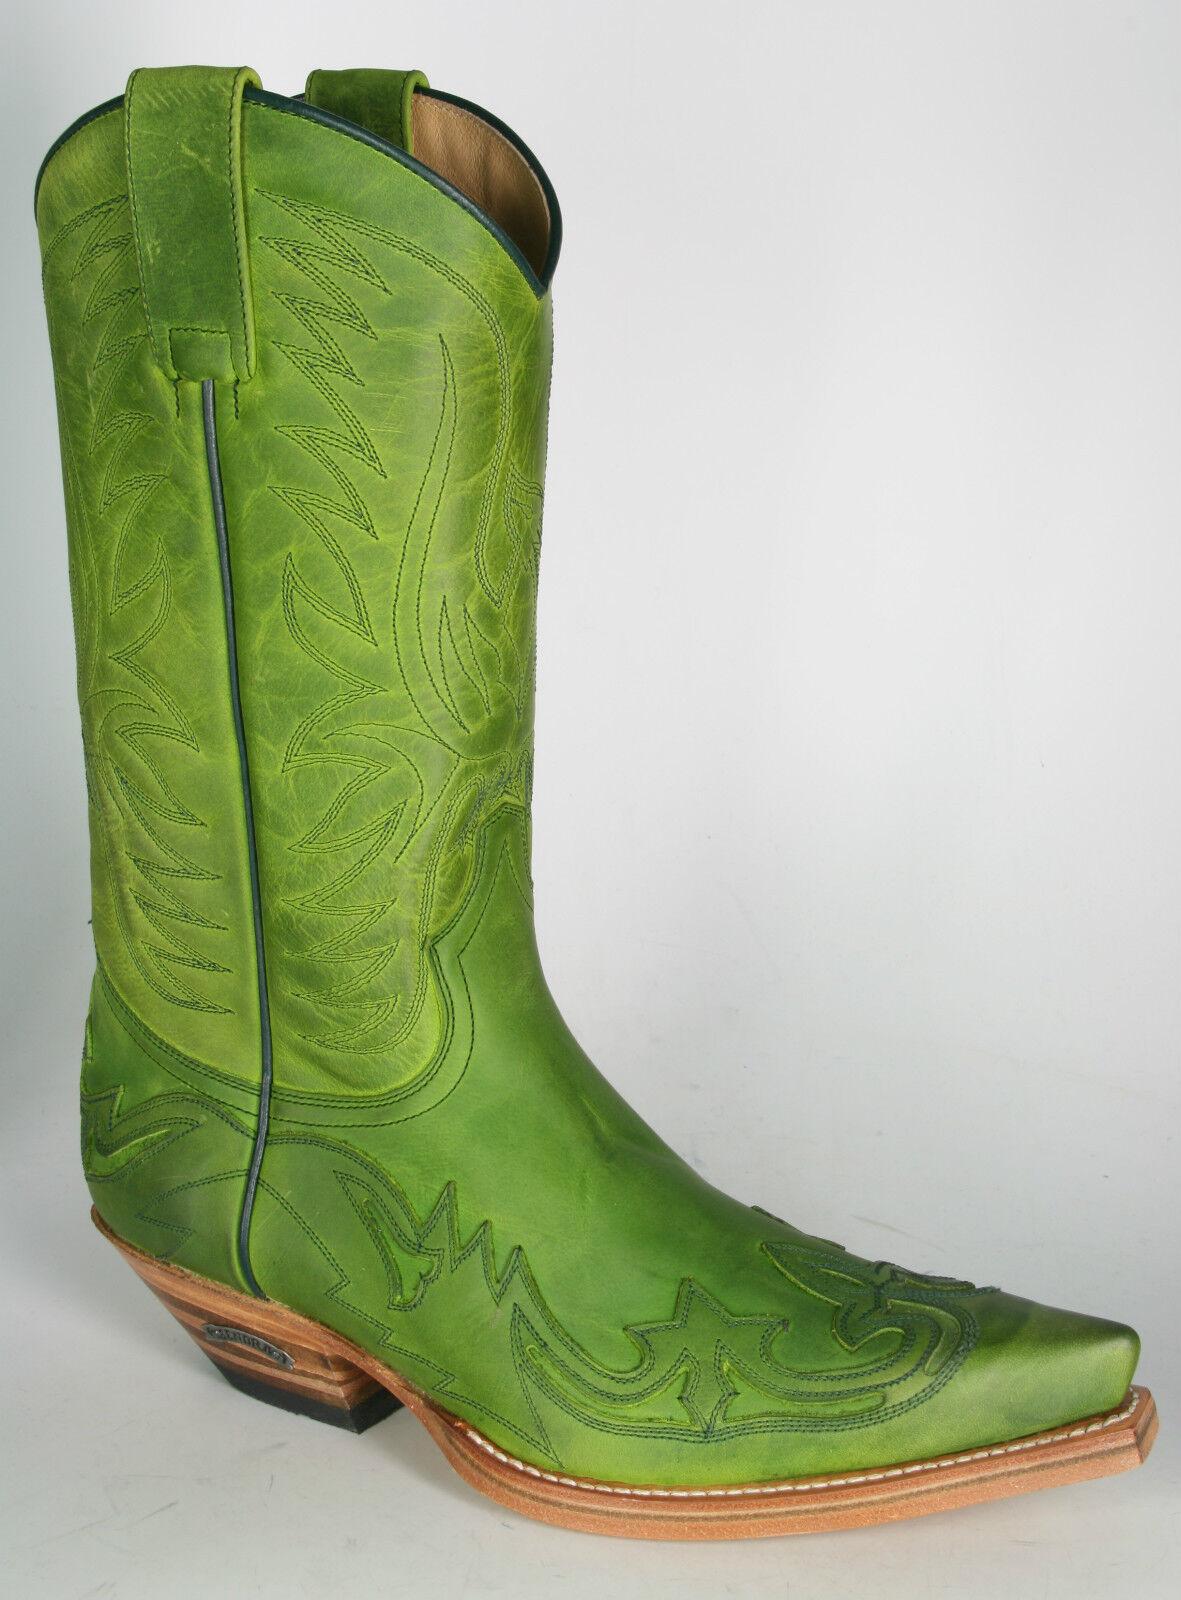 3241 Sendra Sendra Sendra botas de vaquero floter pistacho pistazienverde 4eee22